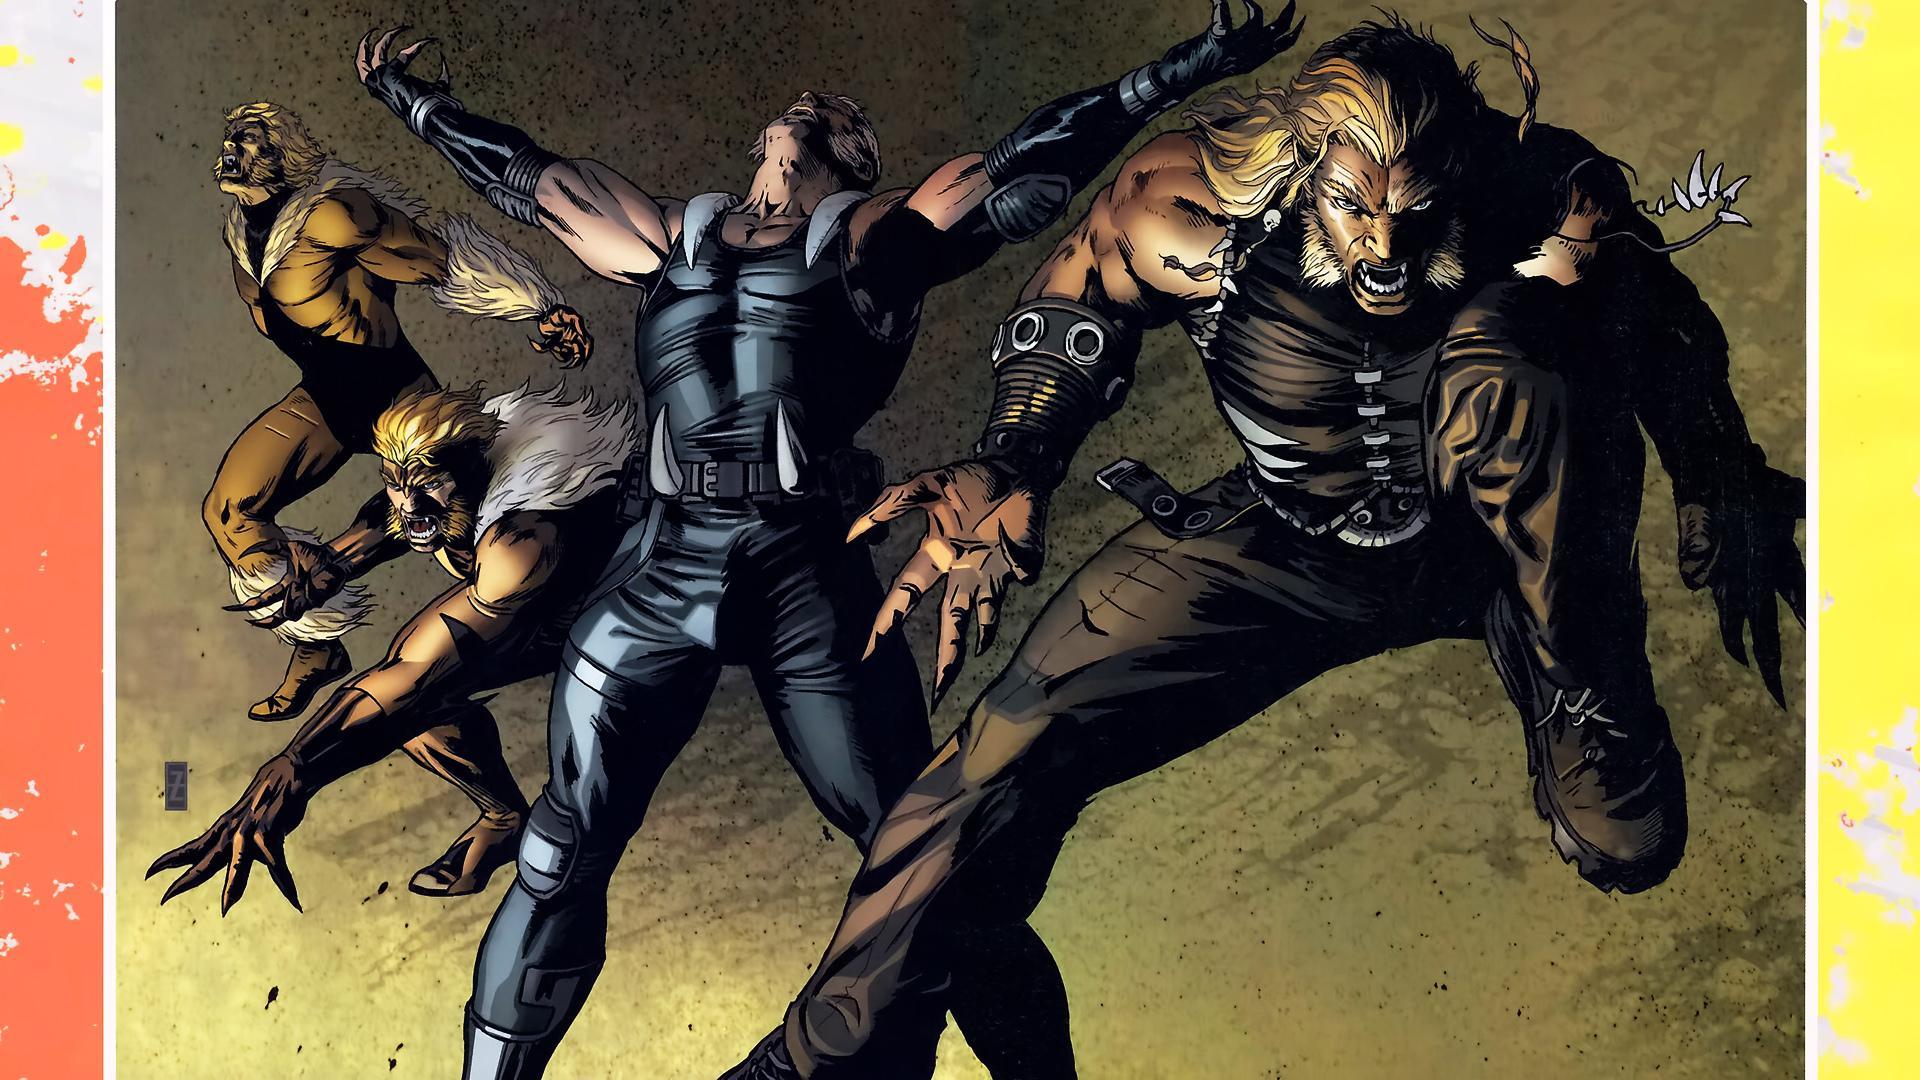 Sabretooth Comics wallpapers HD quality